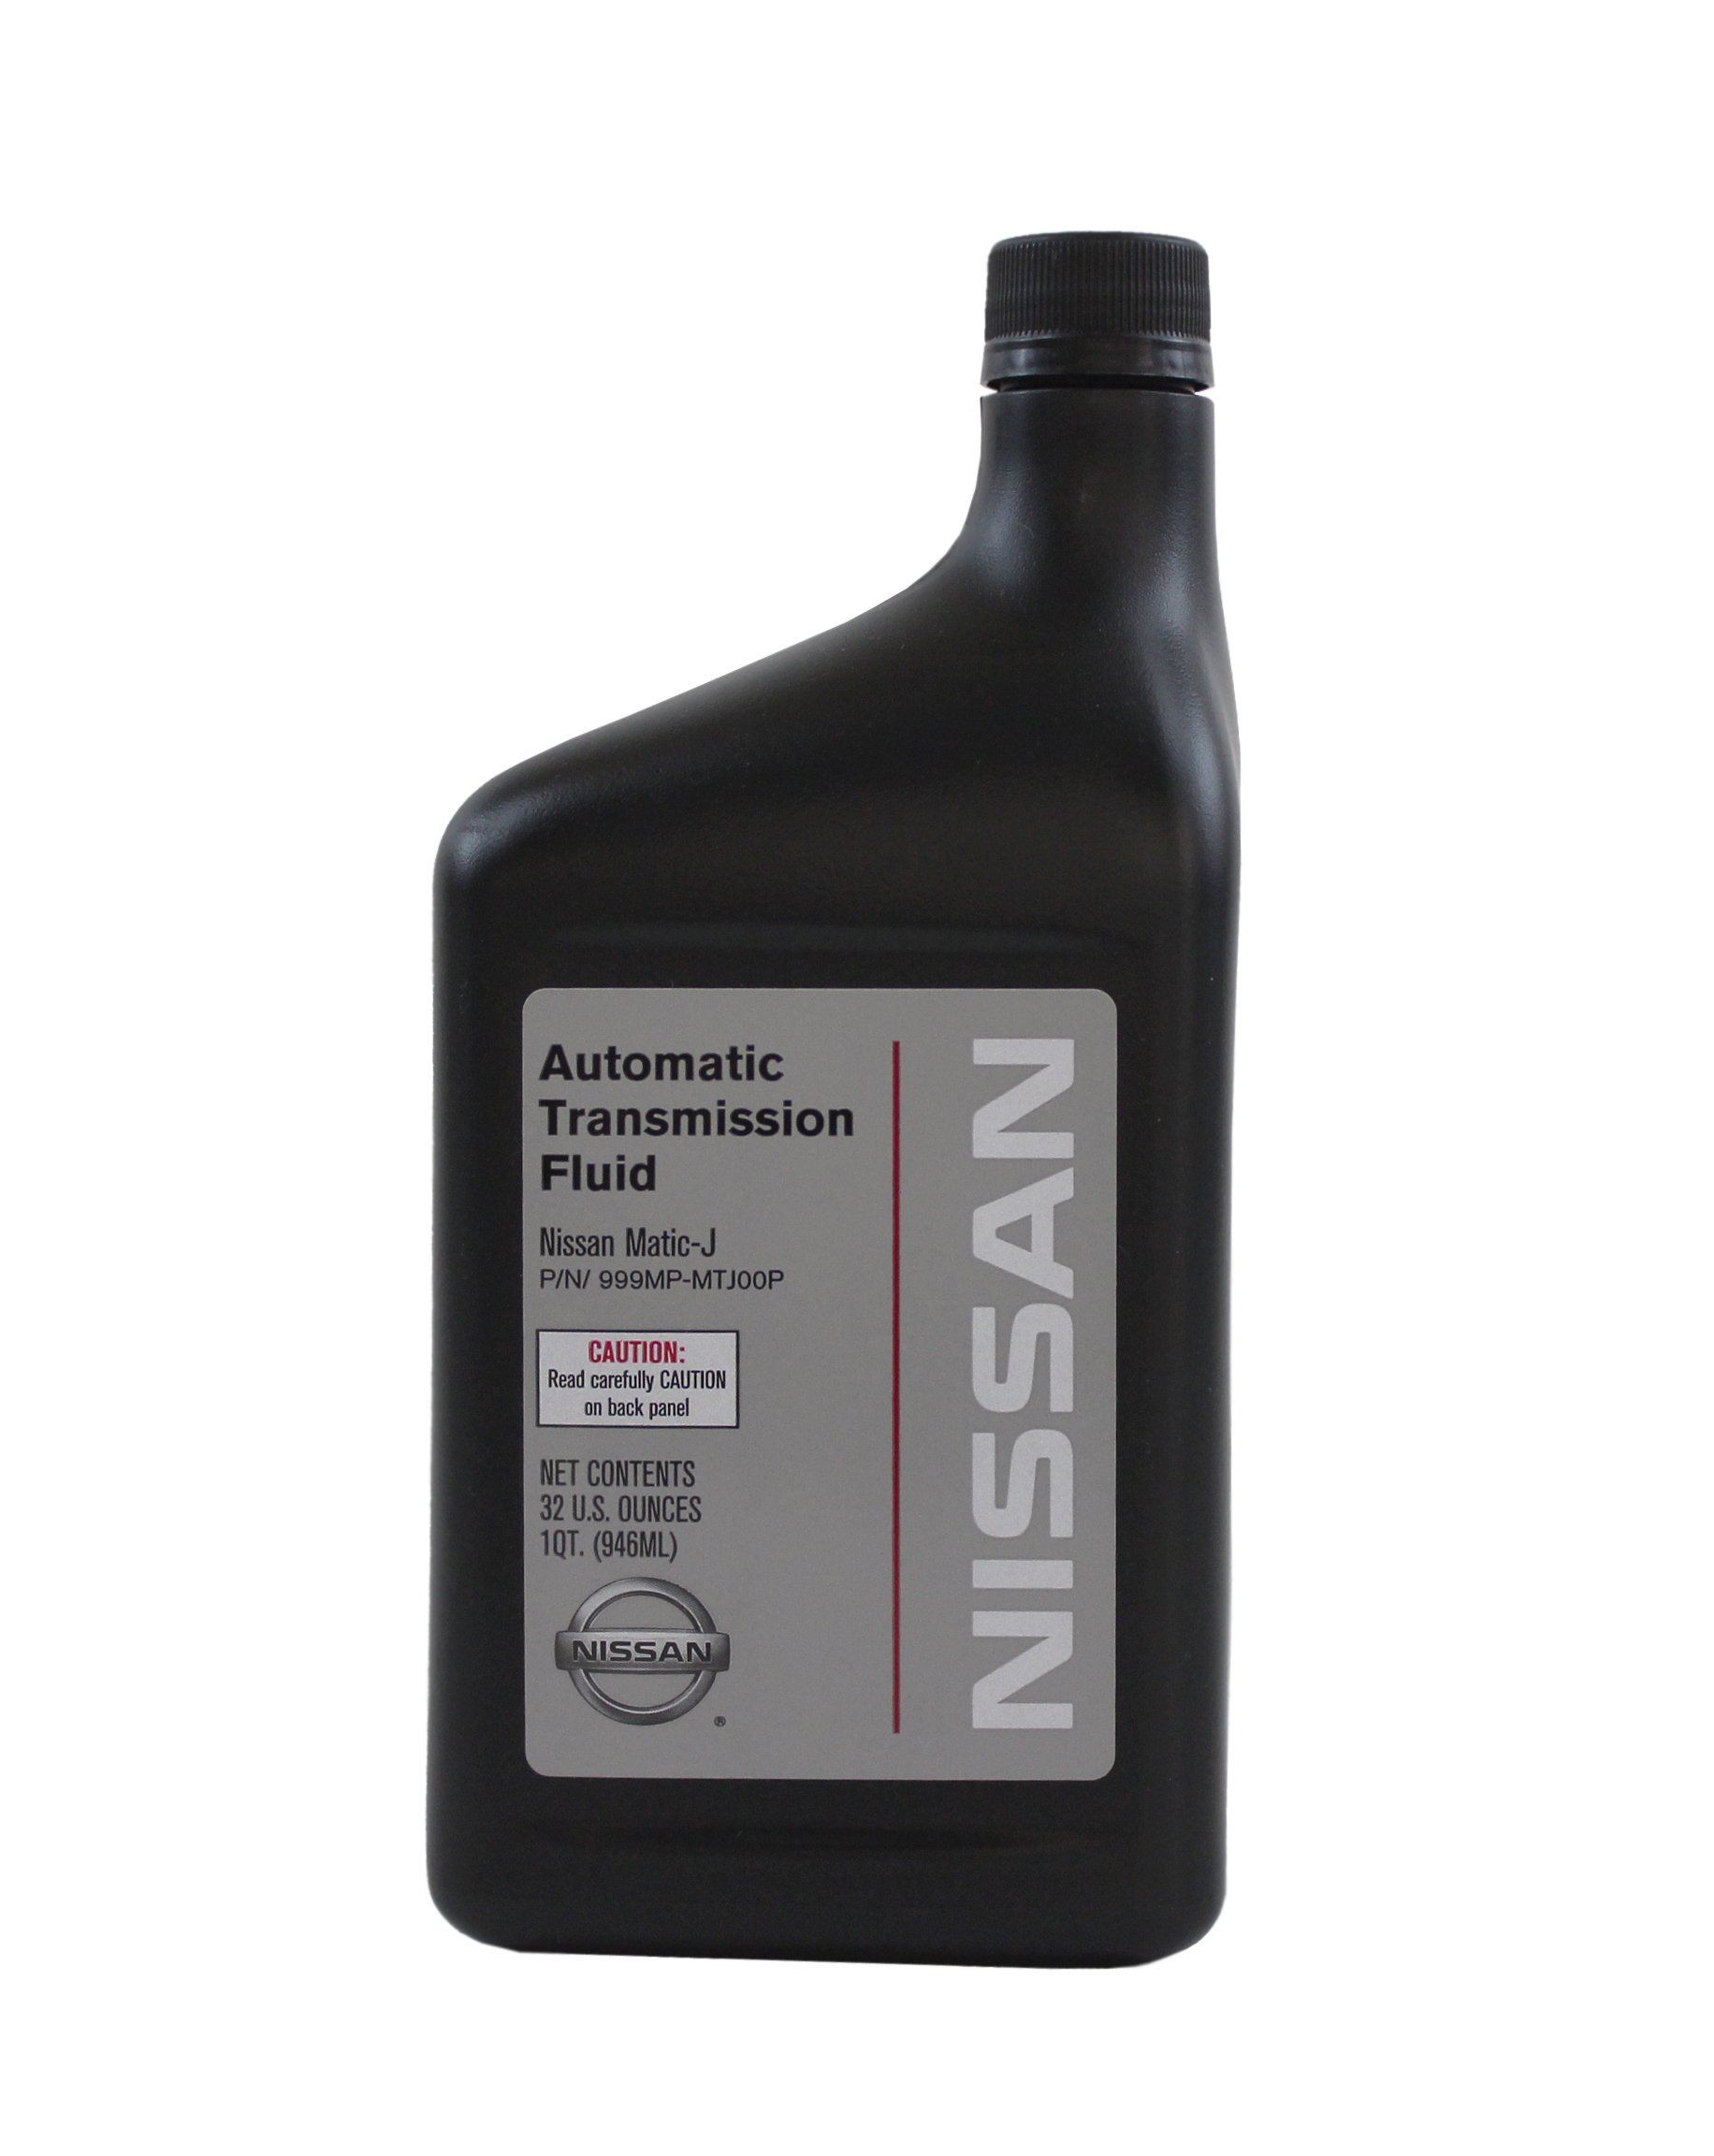 Nissan Genuine Fluid 999MP-MTJ00P Matic-J Automatic Transmission Fluid - 1 Quart by Nissan